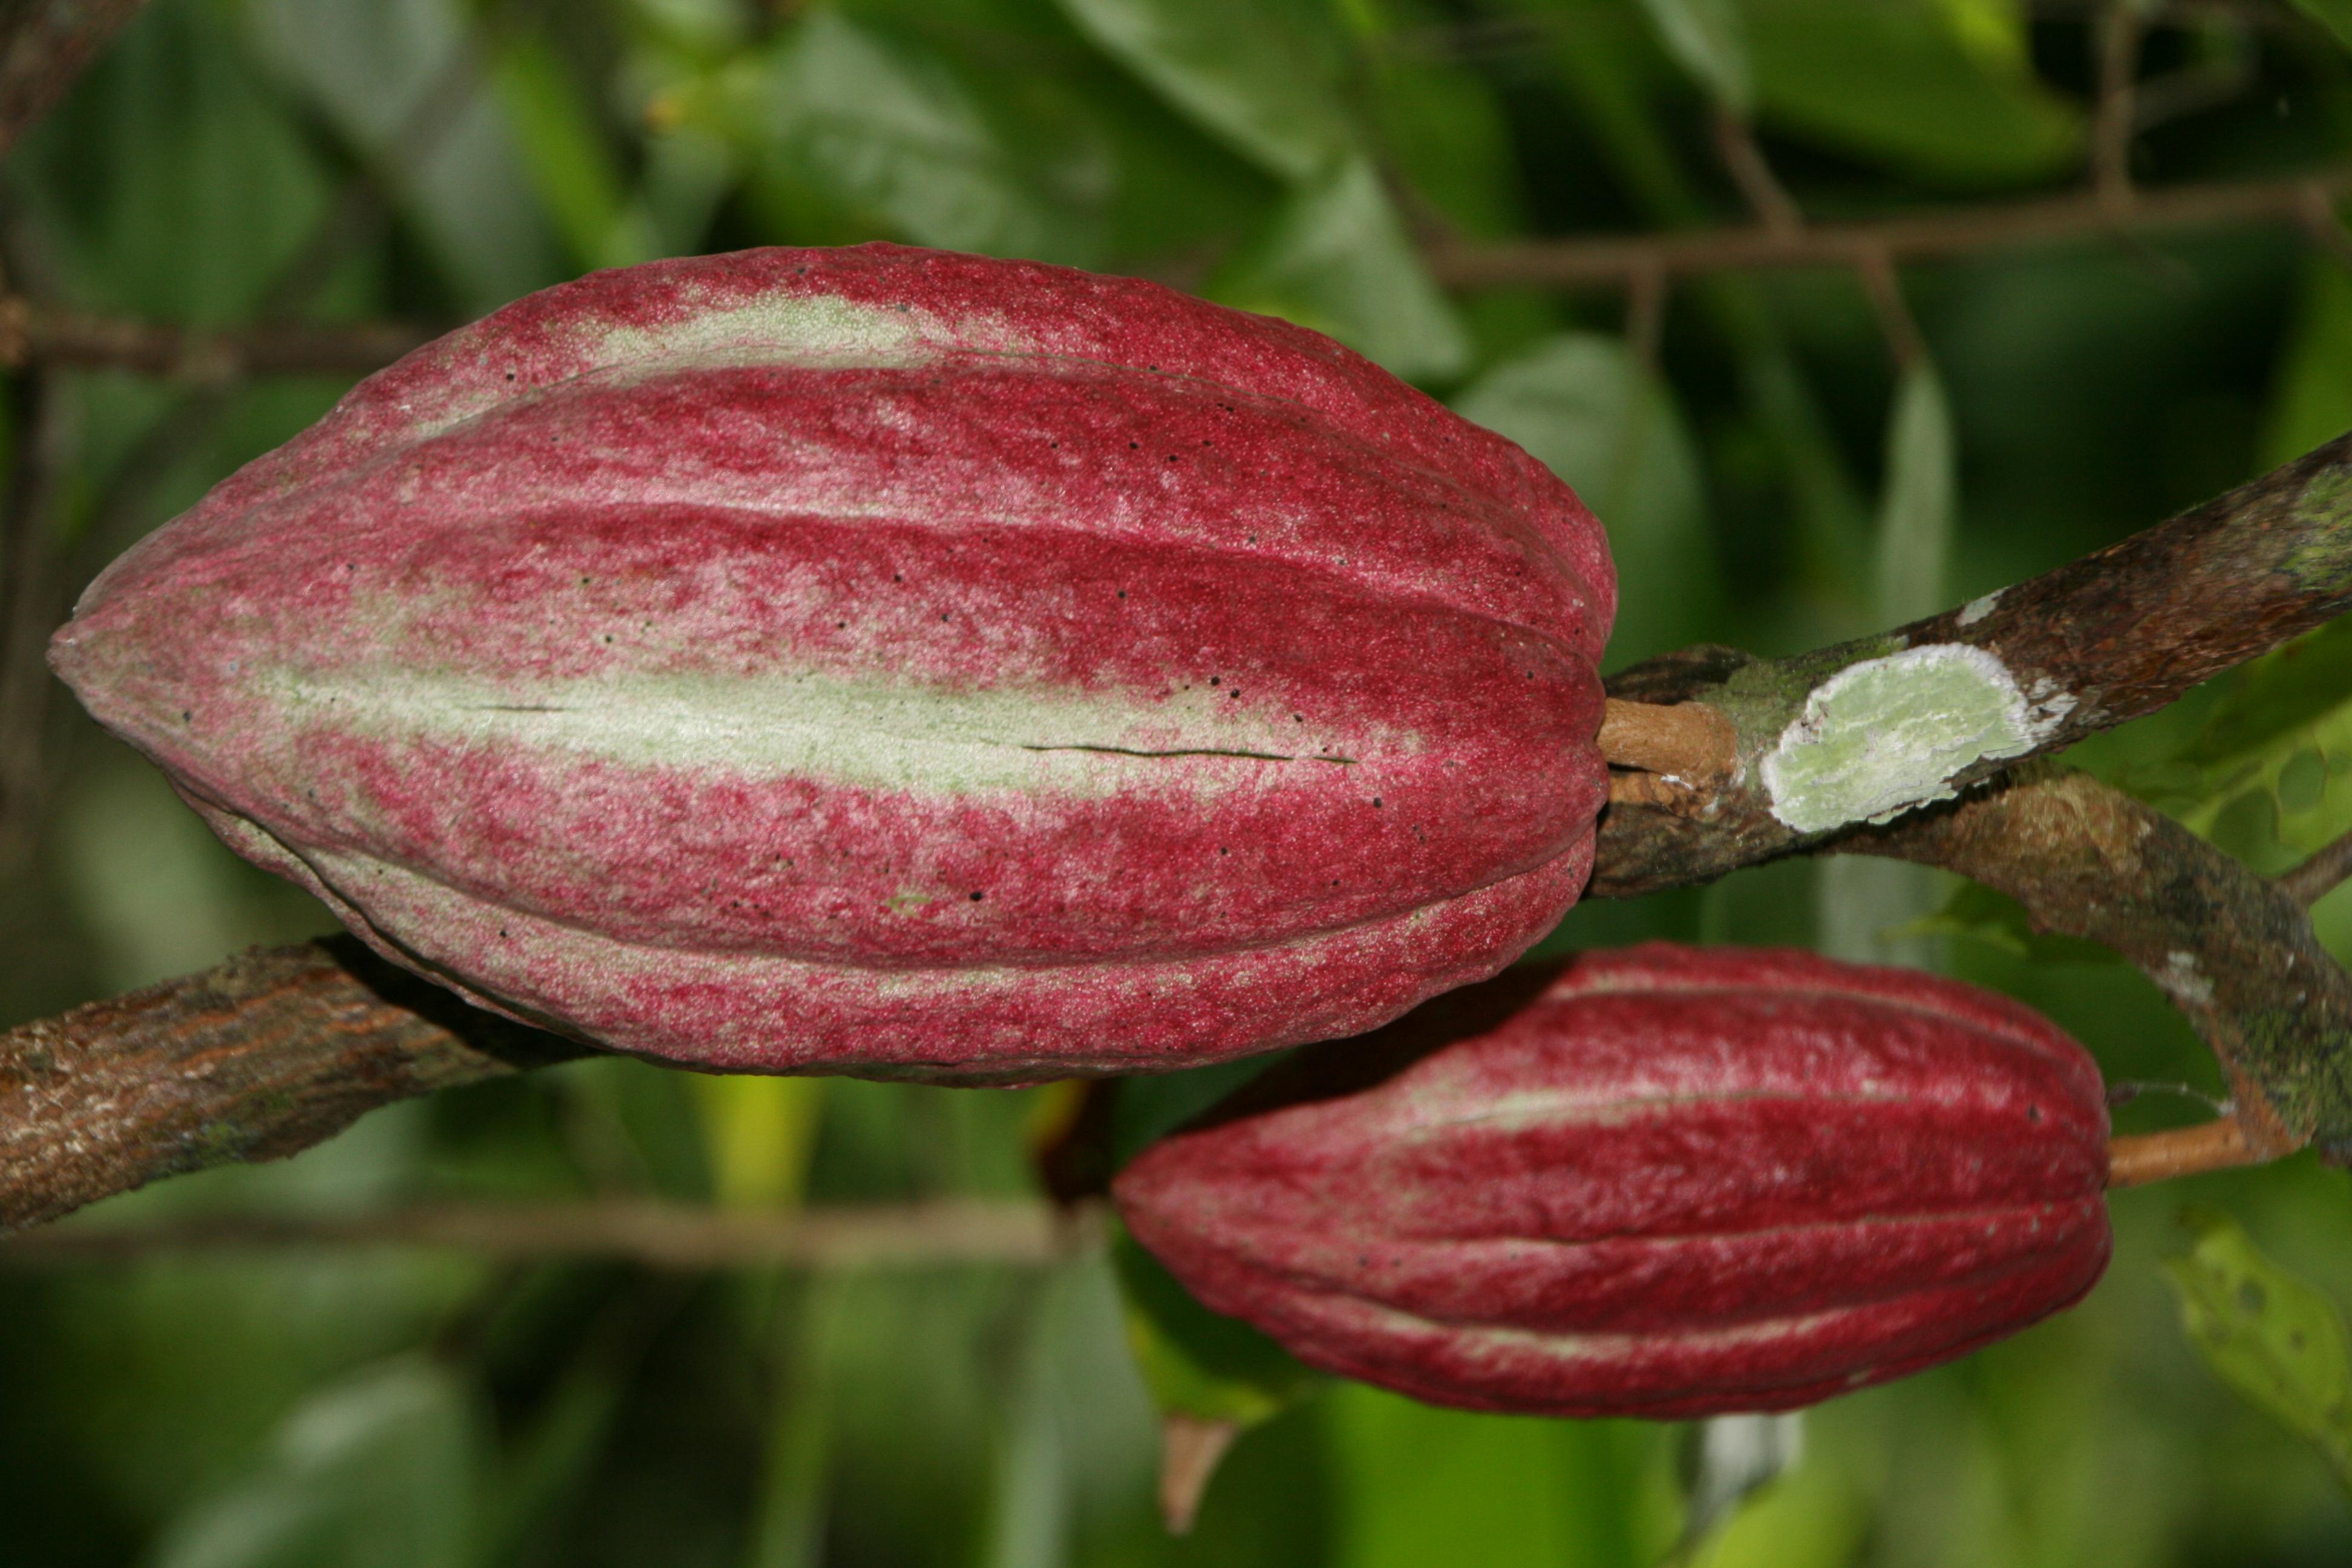 Kakao-aus-nicht-hybridisierten kakaobohnen-Leitnervilla-Altaussee